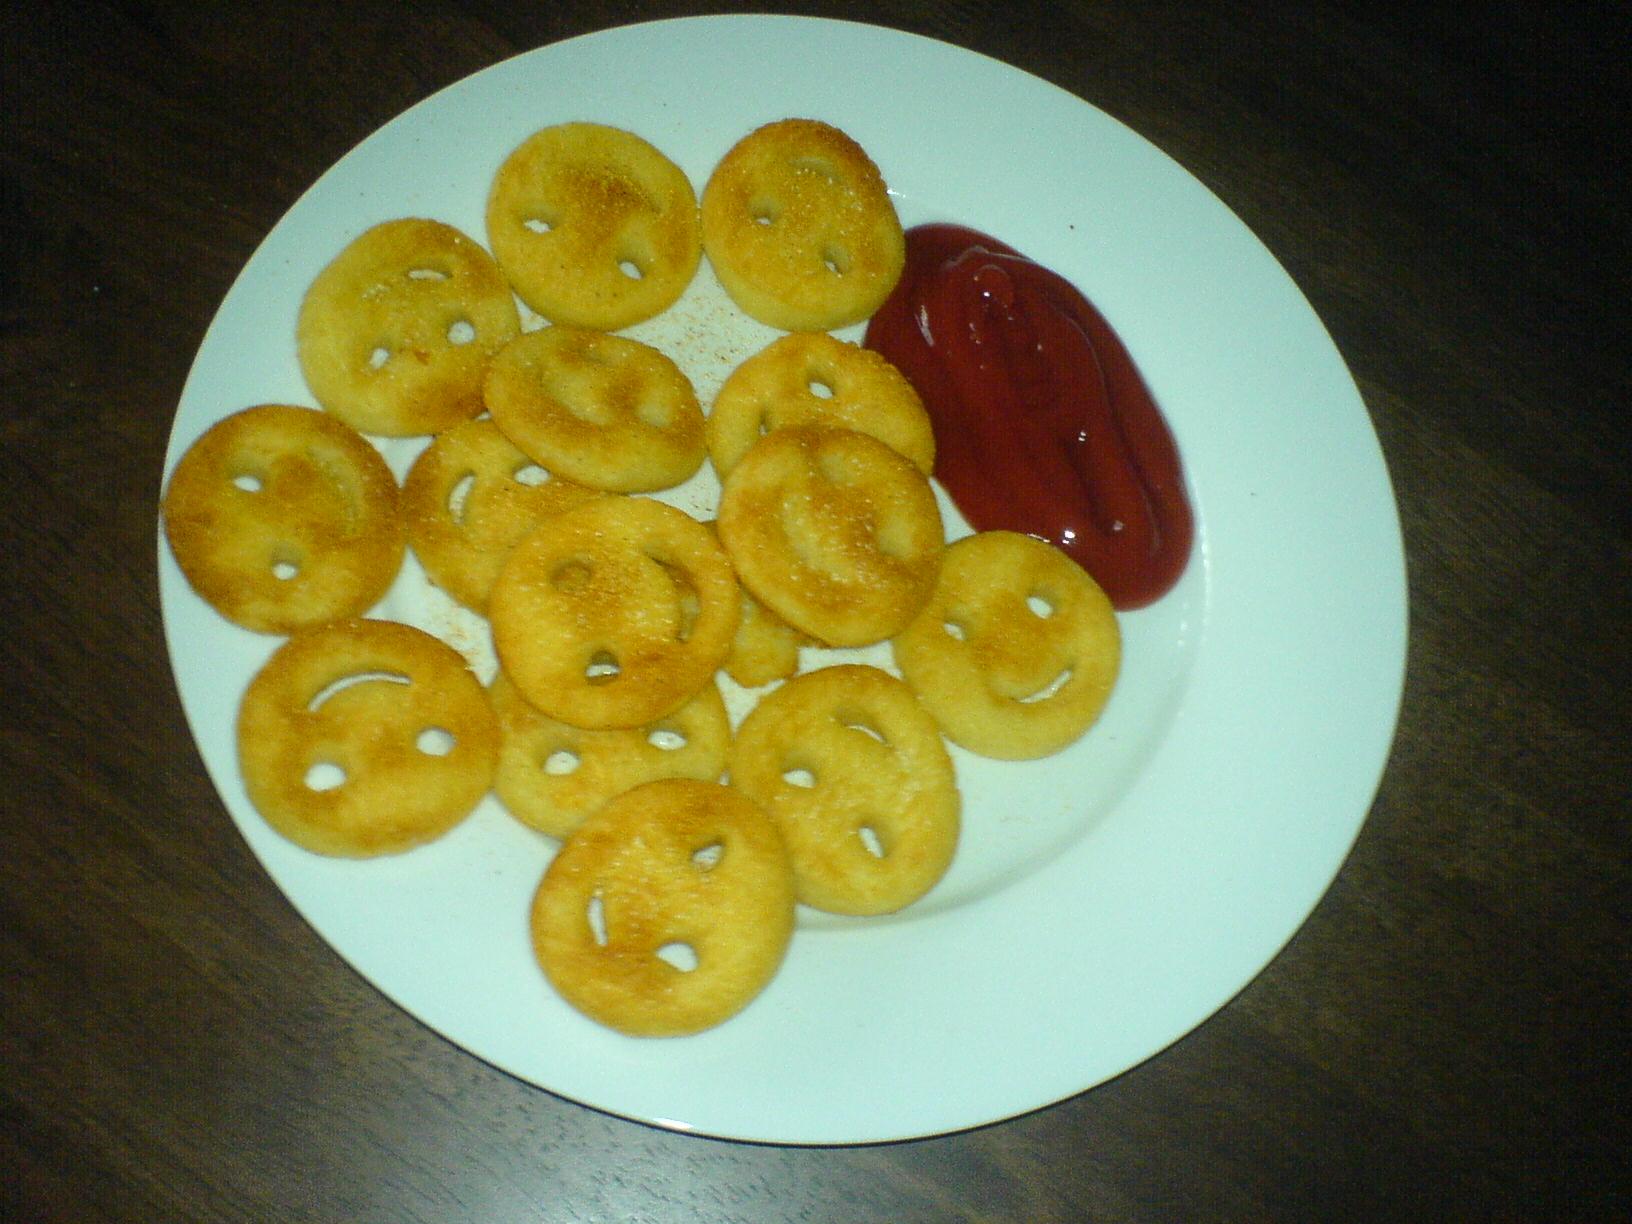 http://foodloader.net/Holz_2011-06-13_Teller_der_guten_Laune.jpg